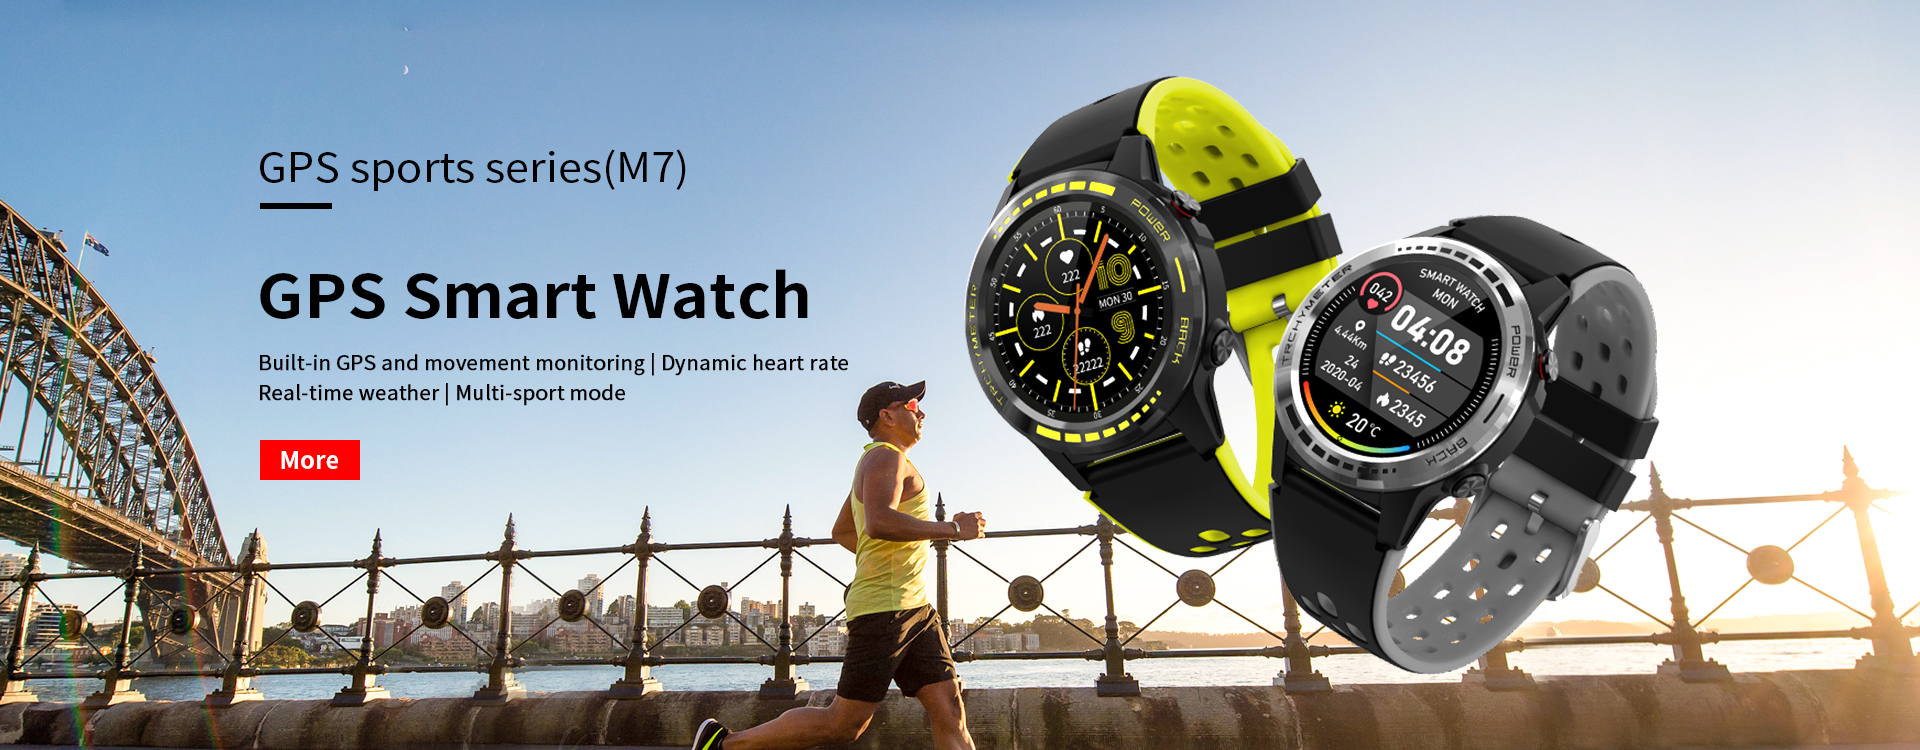 H1de842210c184b7ea4f2e75f730d6aacM GPS Smartwatch Men With SIM Card Fitness Compass Barometer Altitude M5 Mi Smart Watch Men Women 2021 for Android Xiaomi